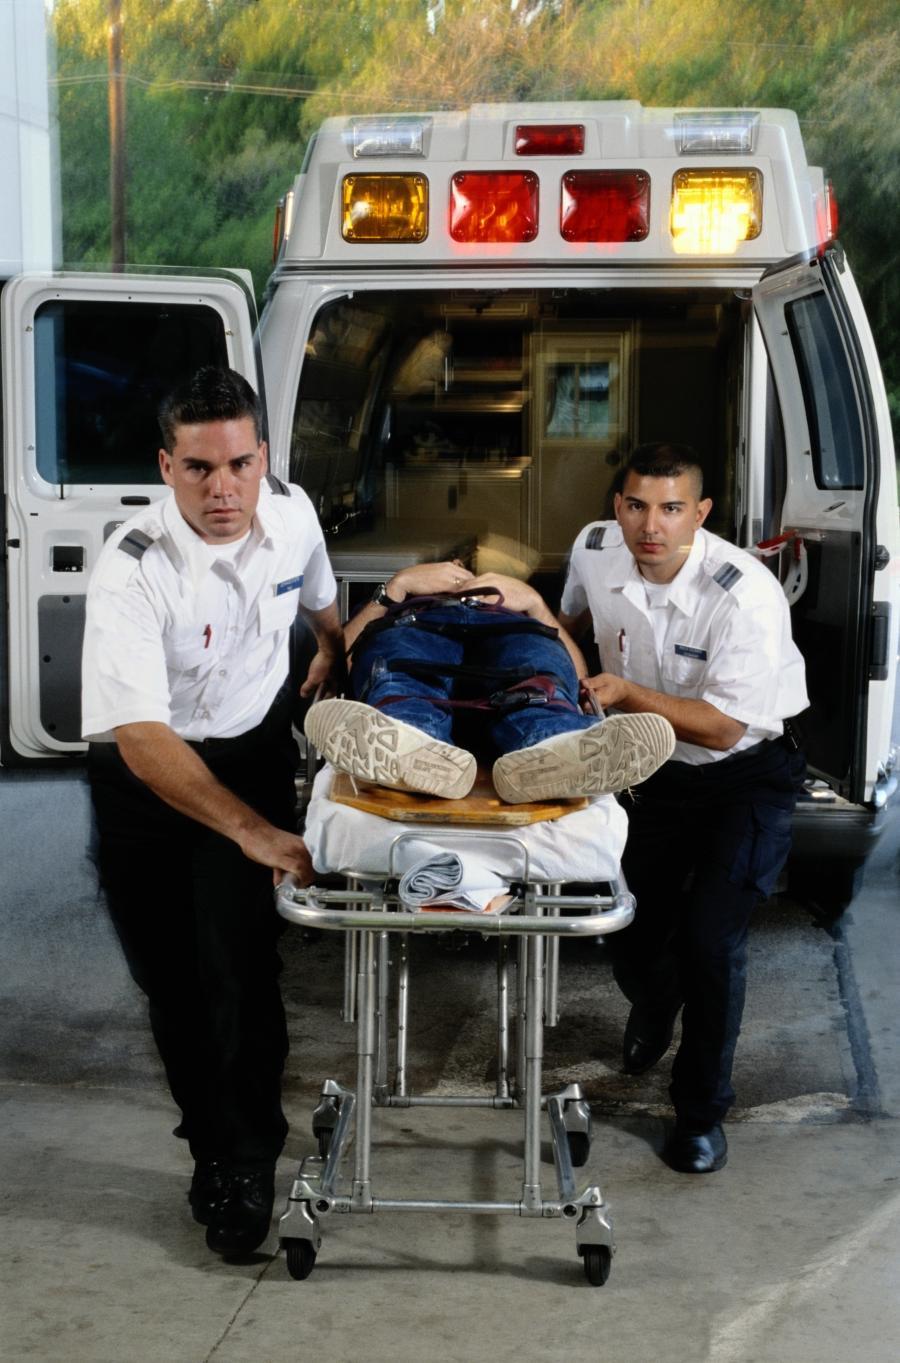 Hospital Emergency Room: Emergency Room Accident Photos